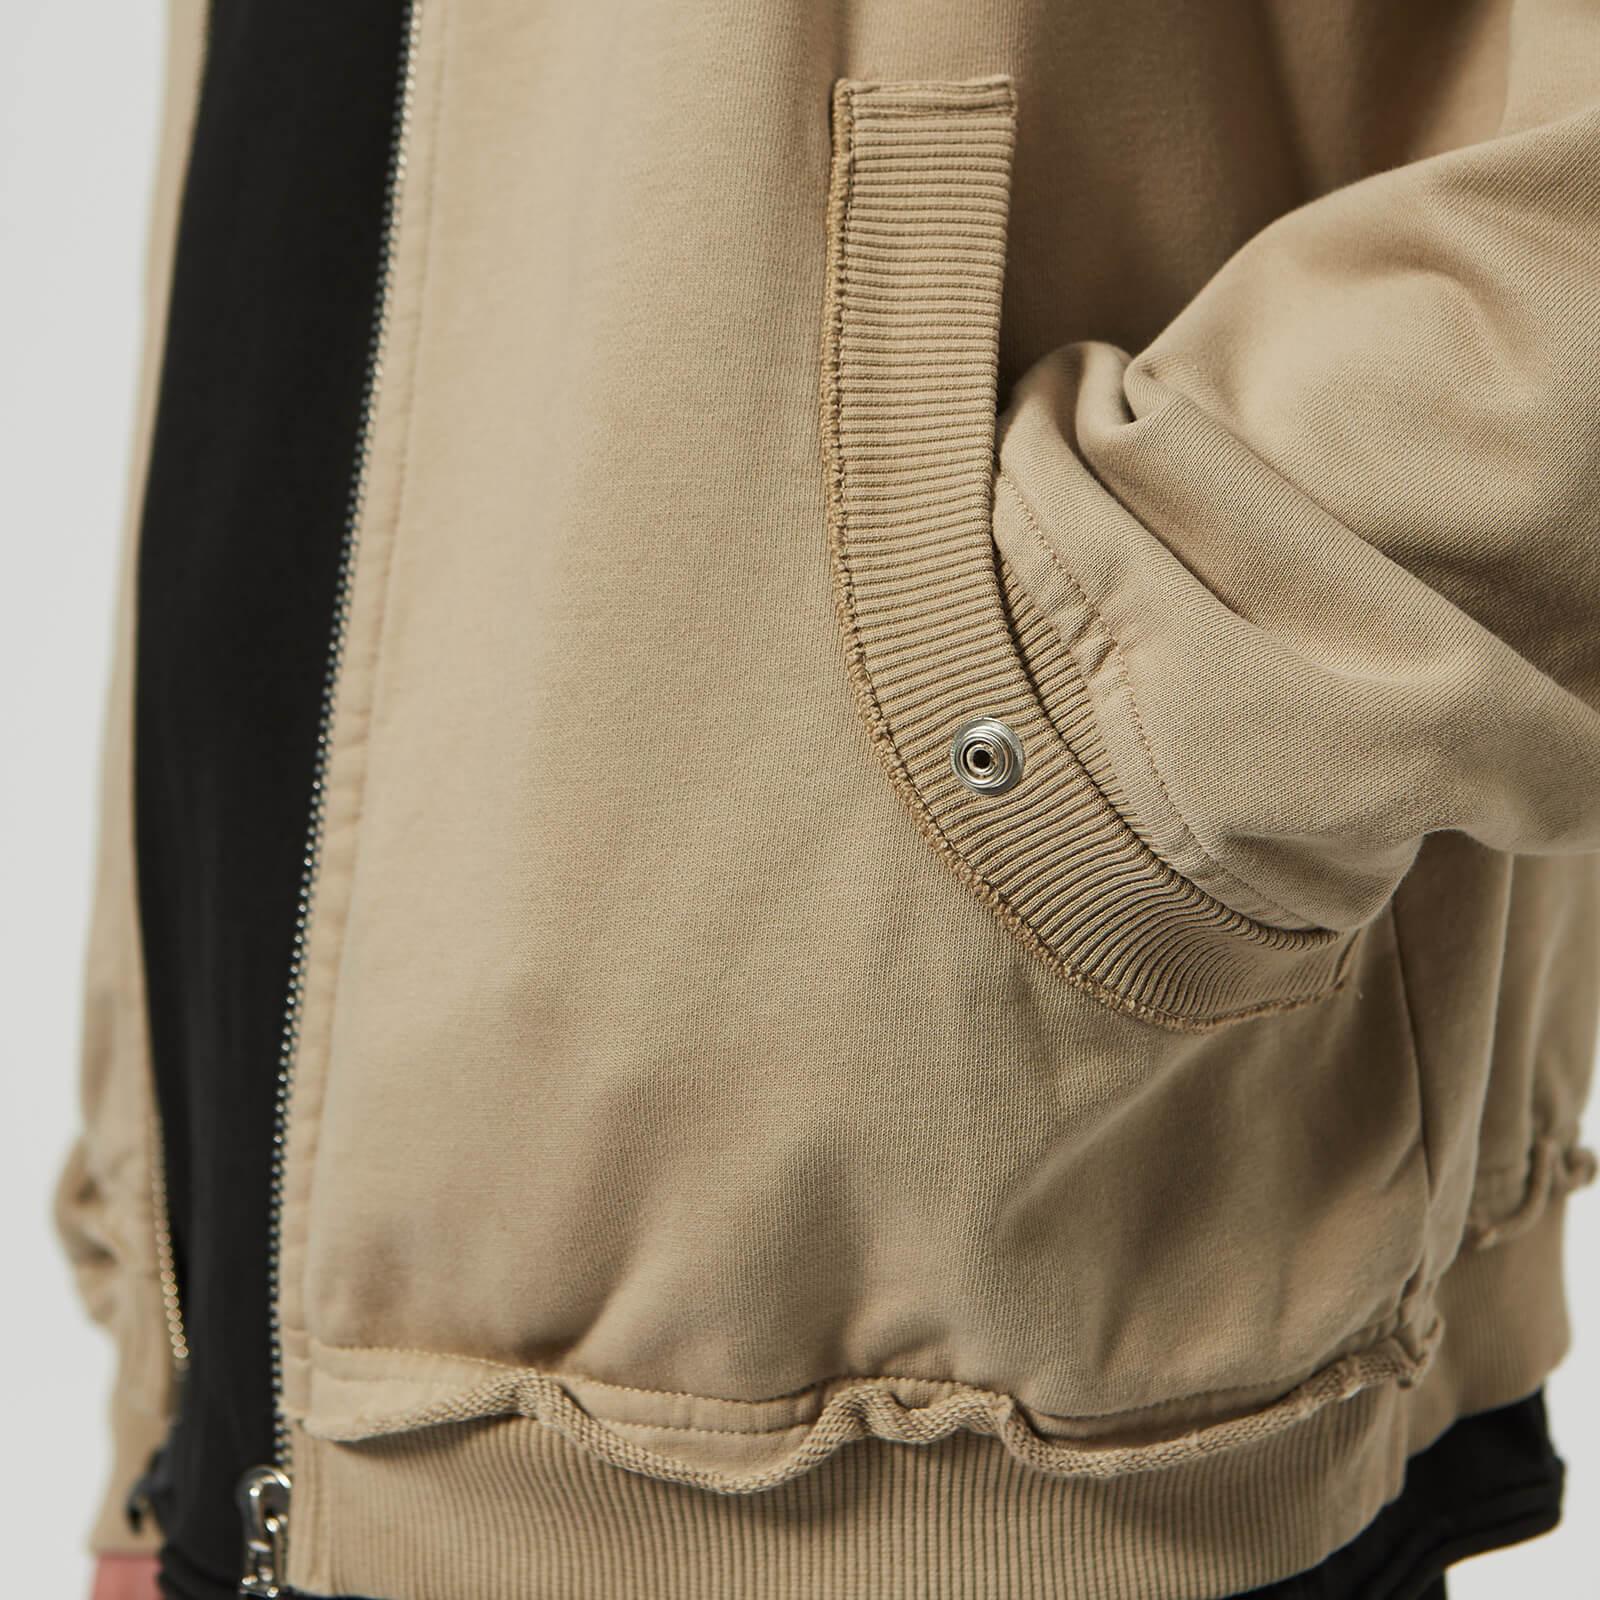 Helmut Lang Cotton Distressed Jacket in Silver (Metallic) for Men